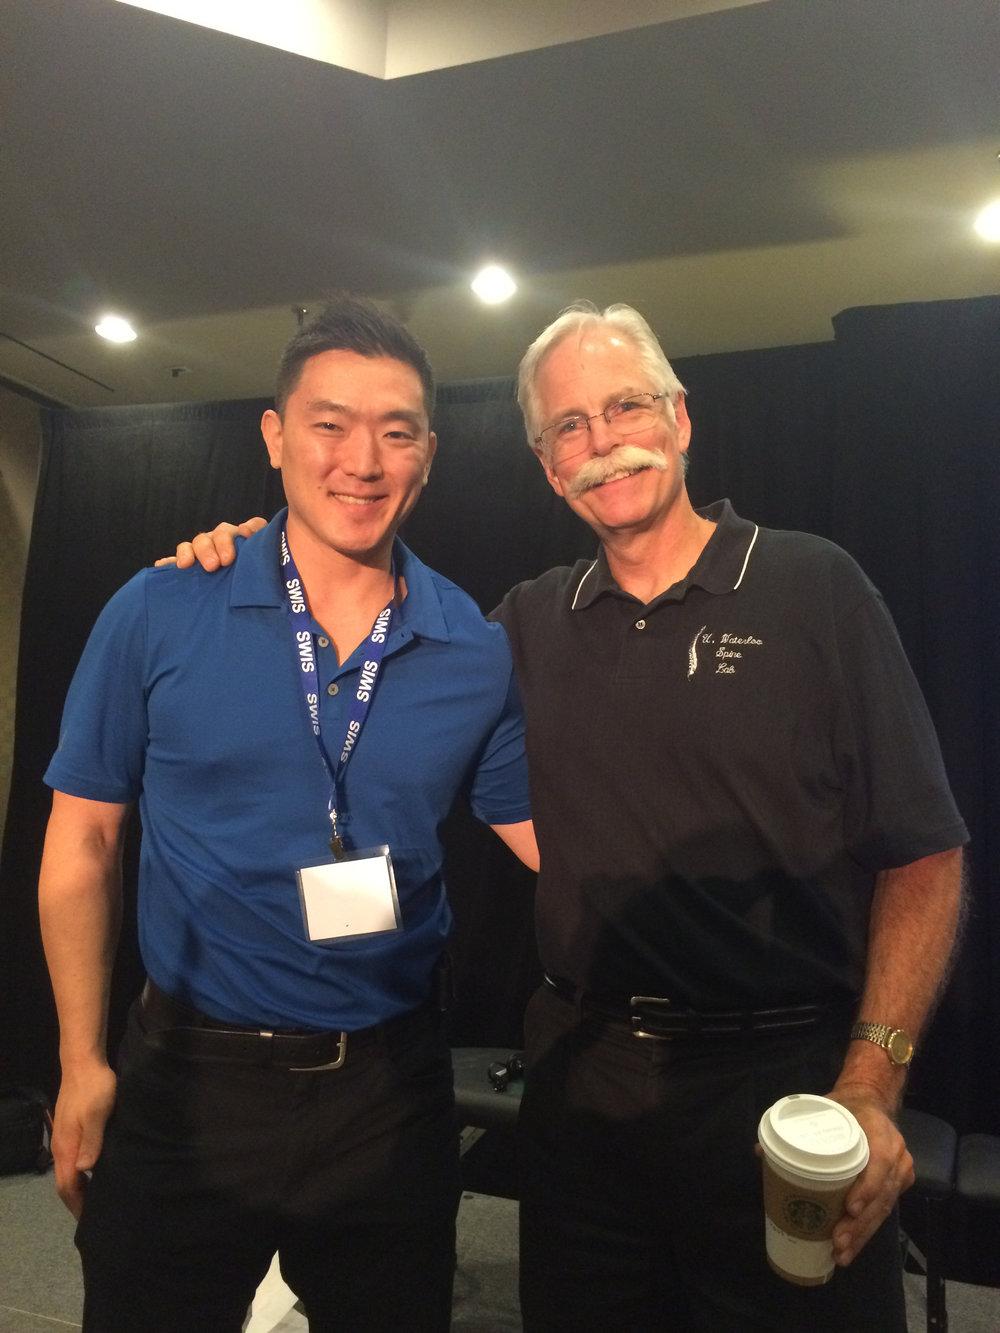 Stu McGill - The Spine Biomechanist